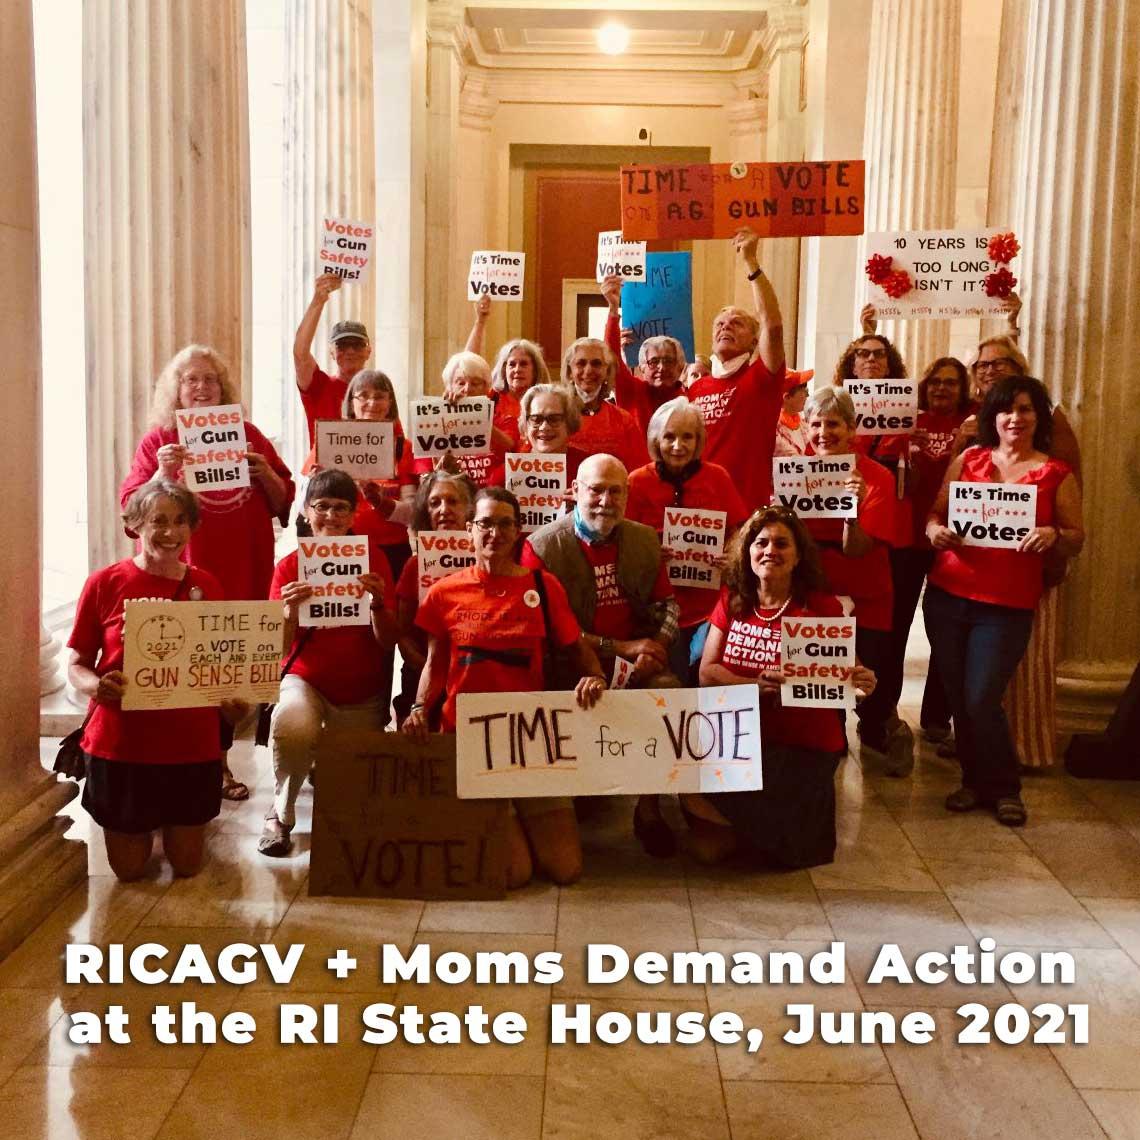 CGVPRI supporters demand votes on gun safety bills, June 2021 at RI State House